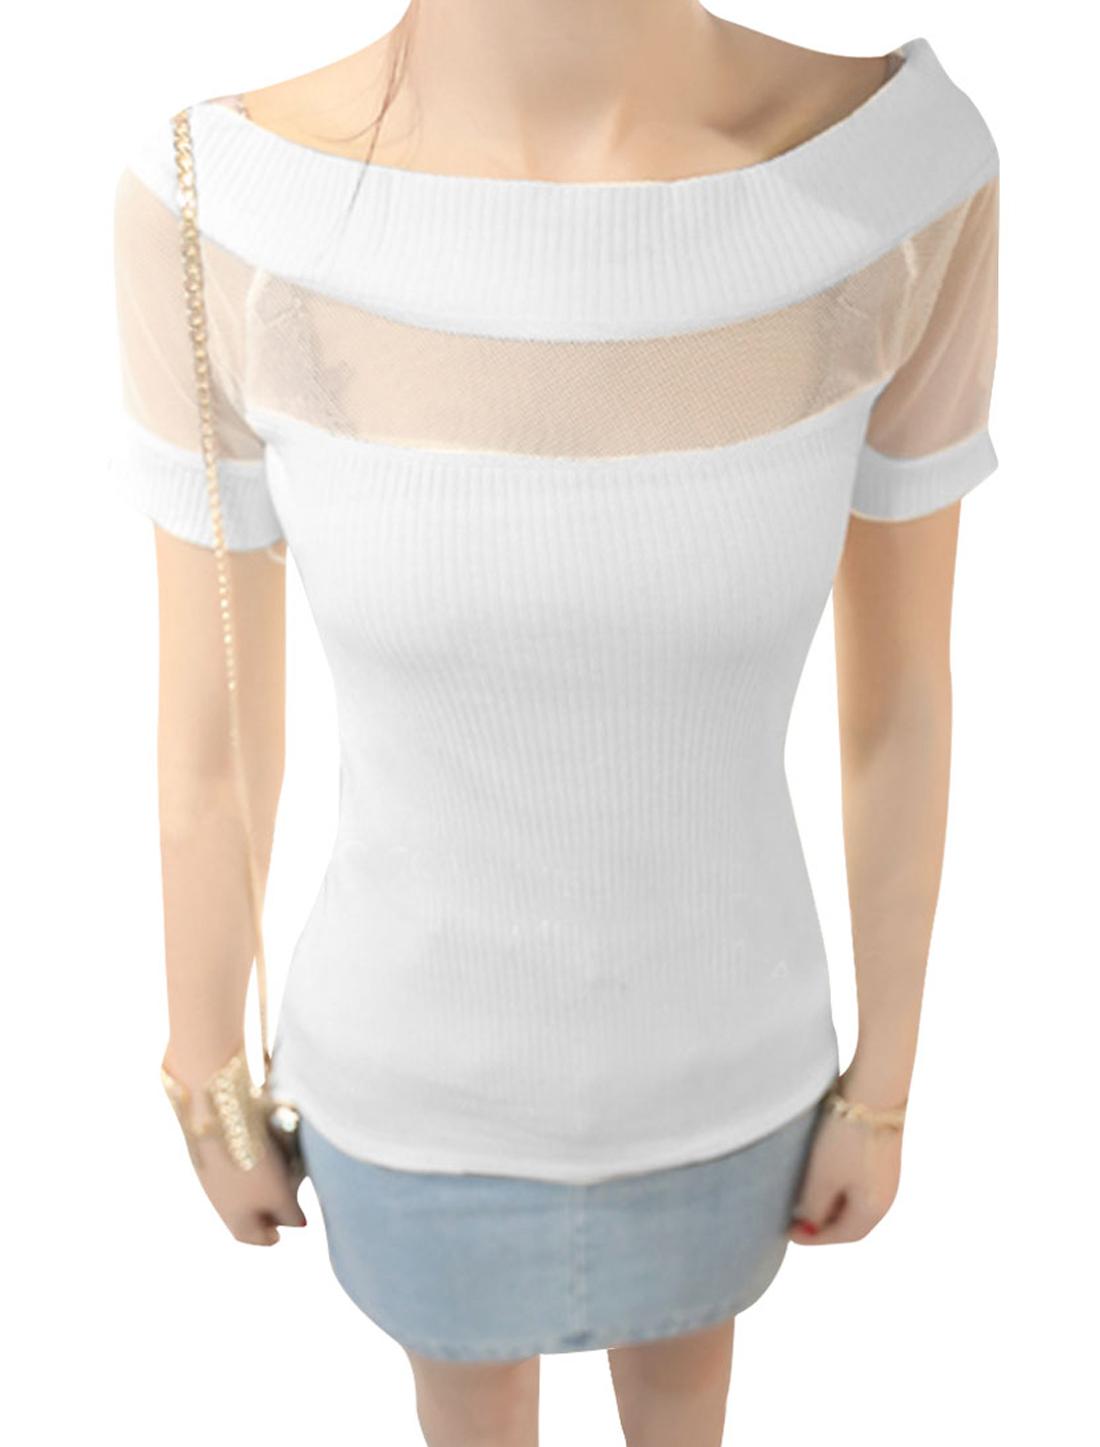 Lady Pullover Mesh Detail Splice Semi-sheer White Ribing Blouse XS